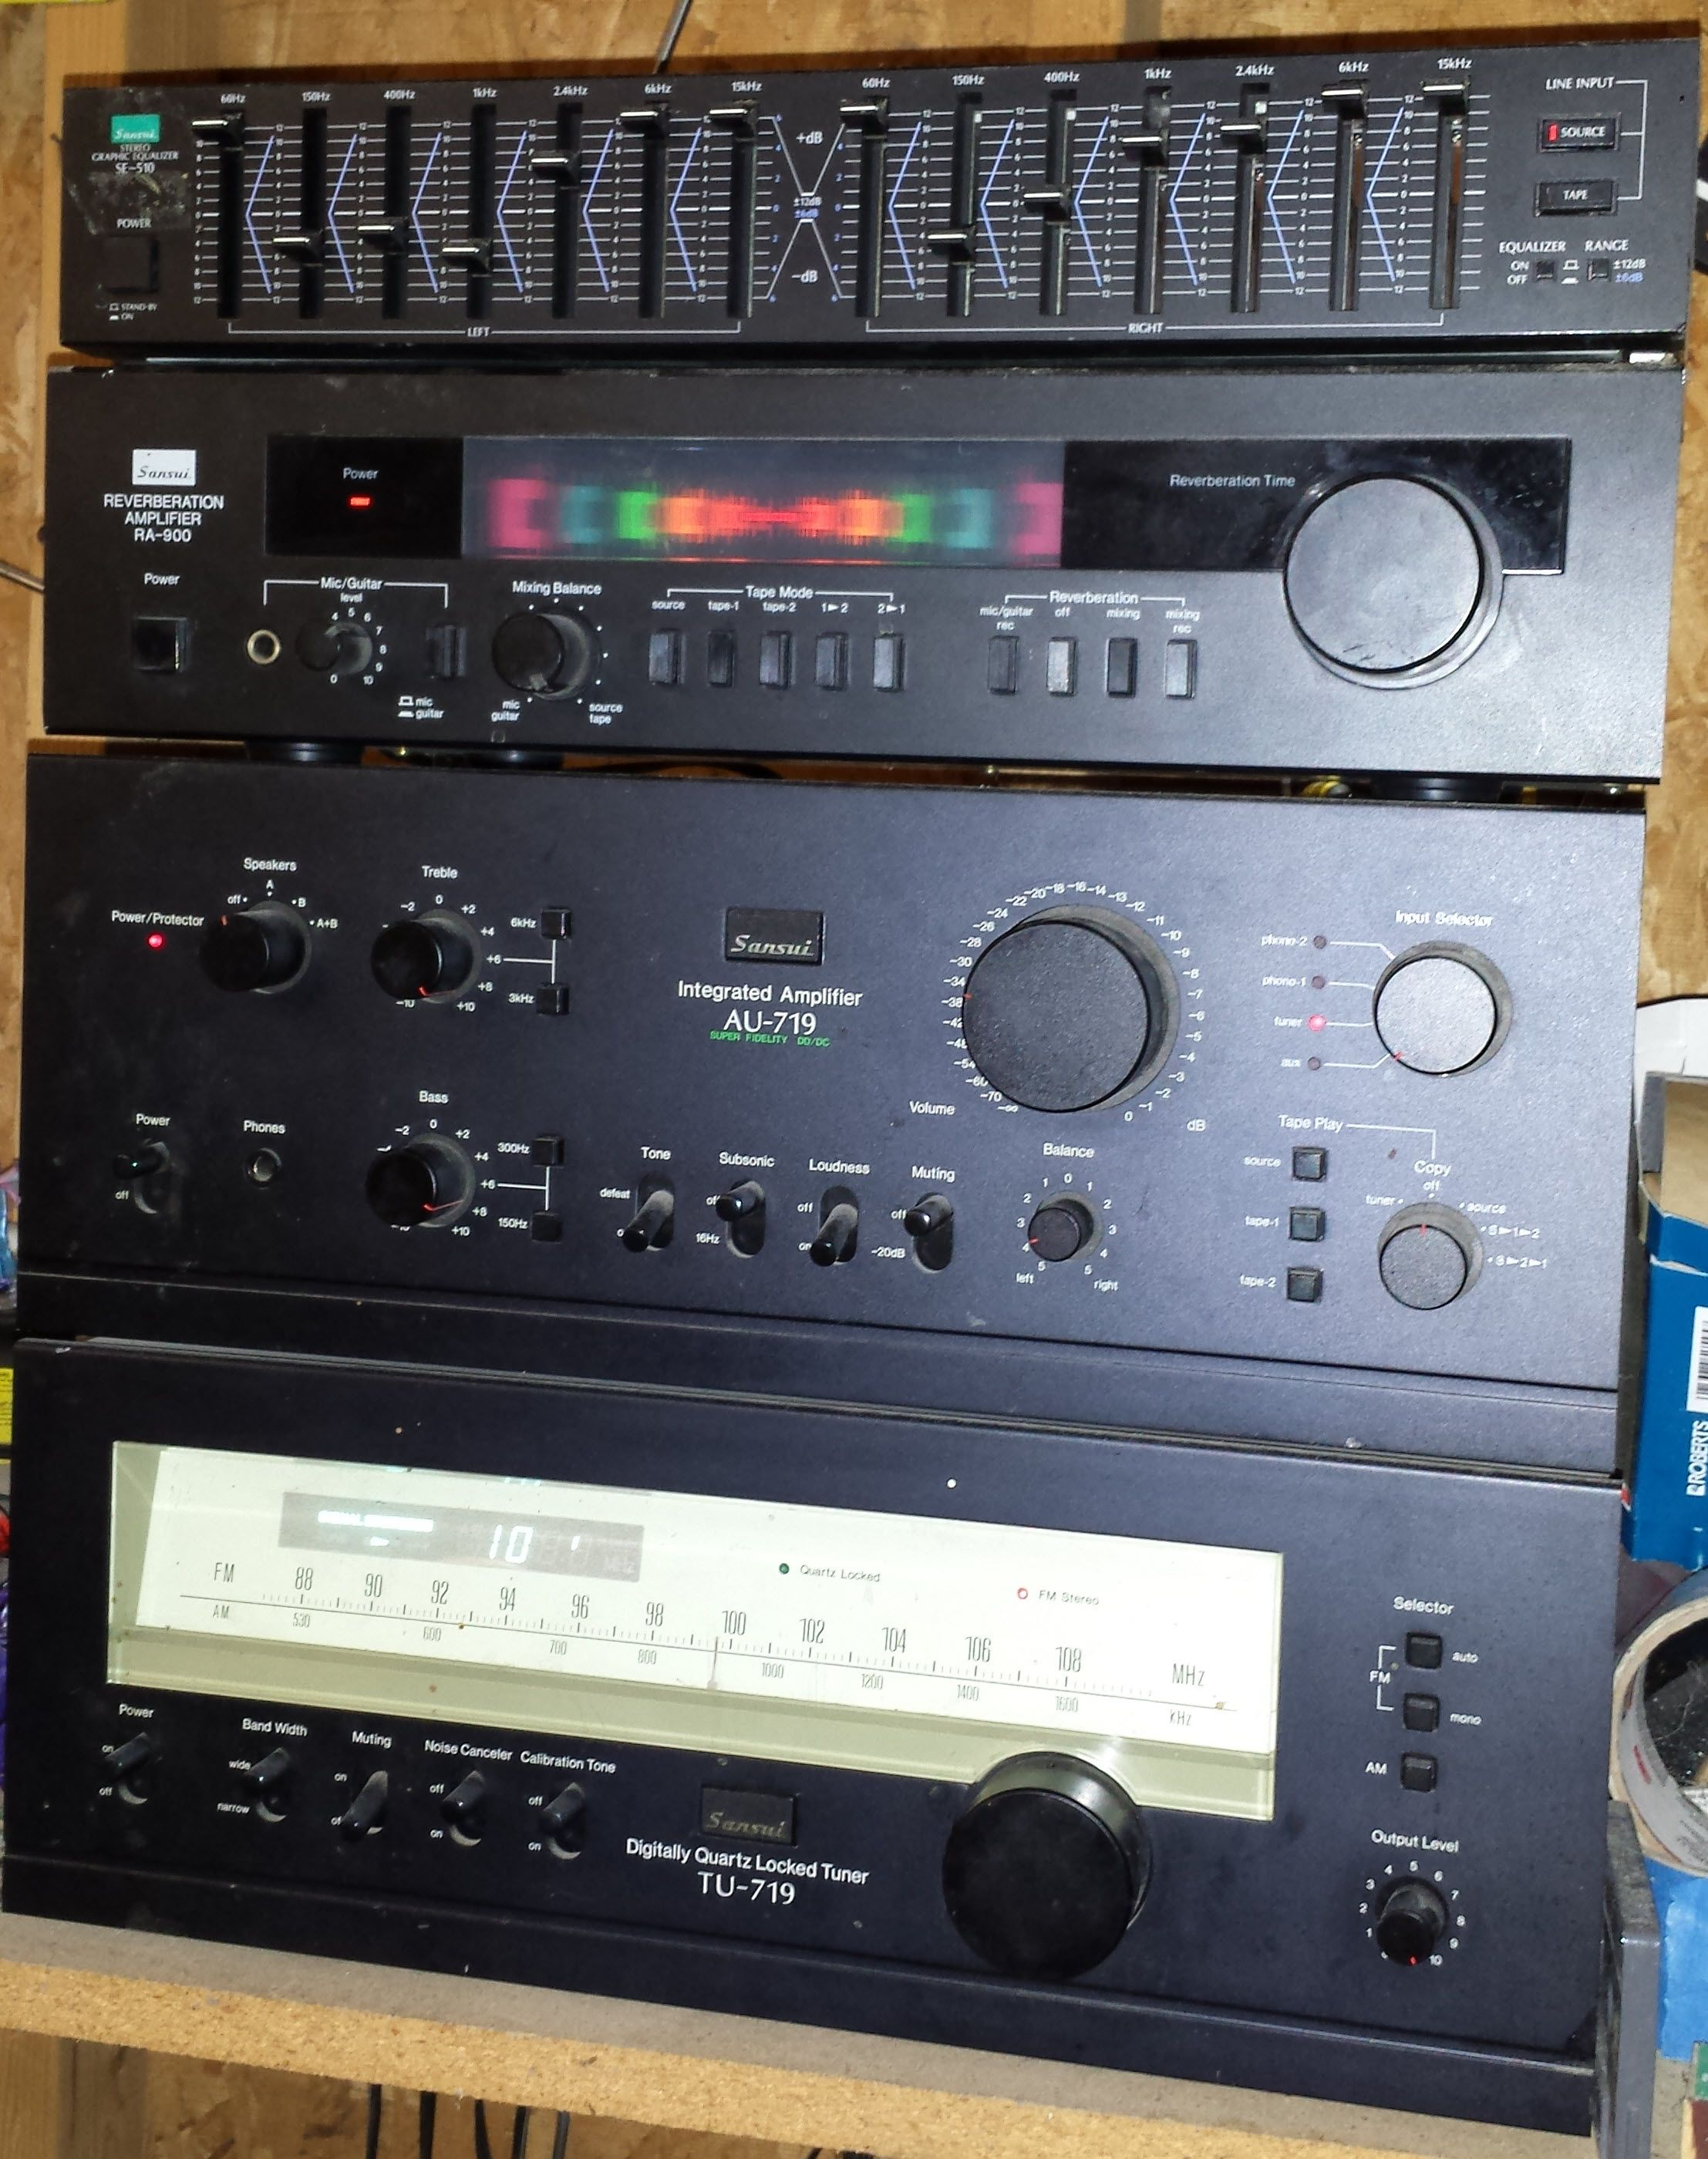 Summer dress ebay au 719 integrated amplifier